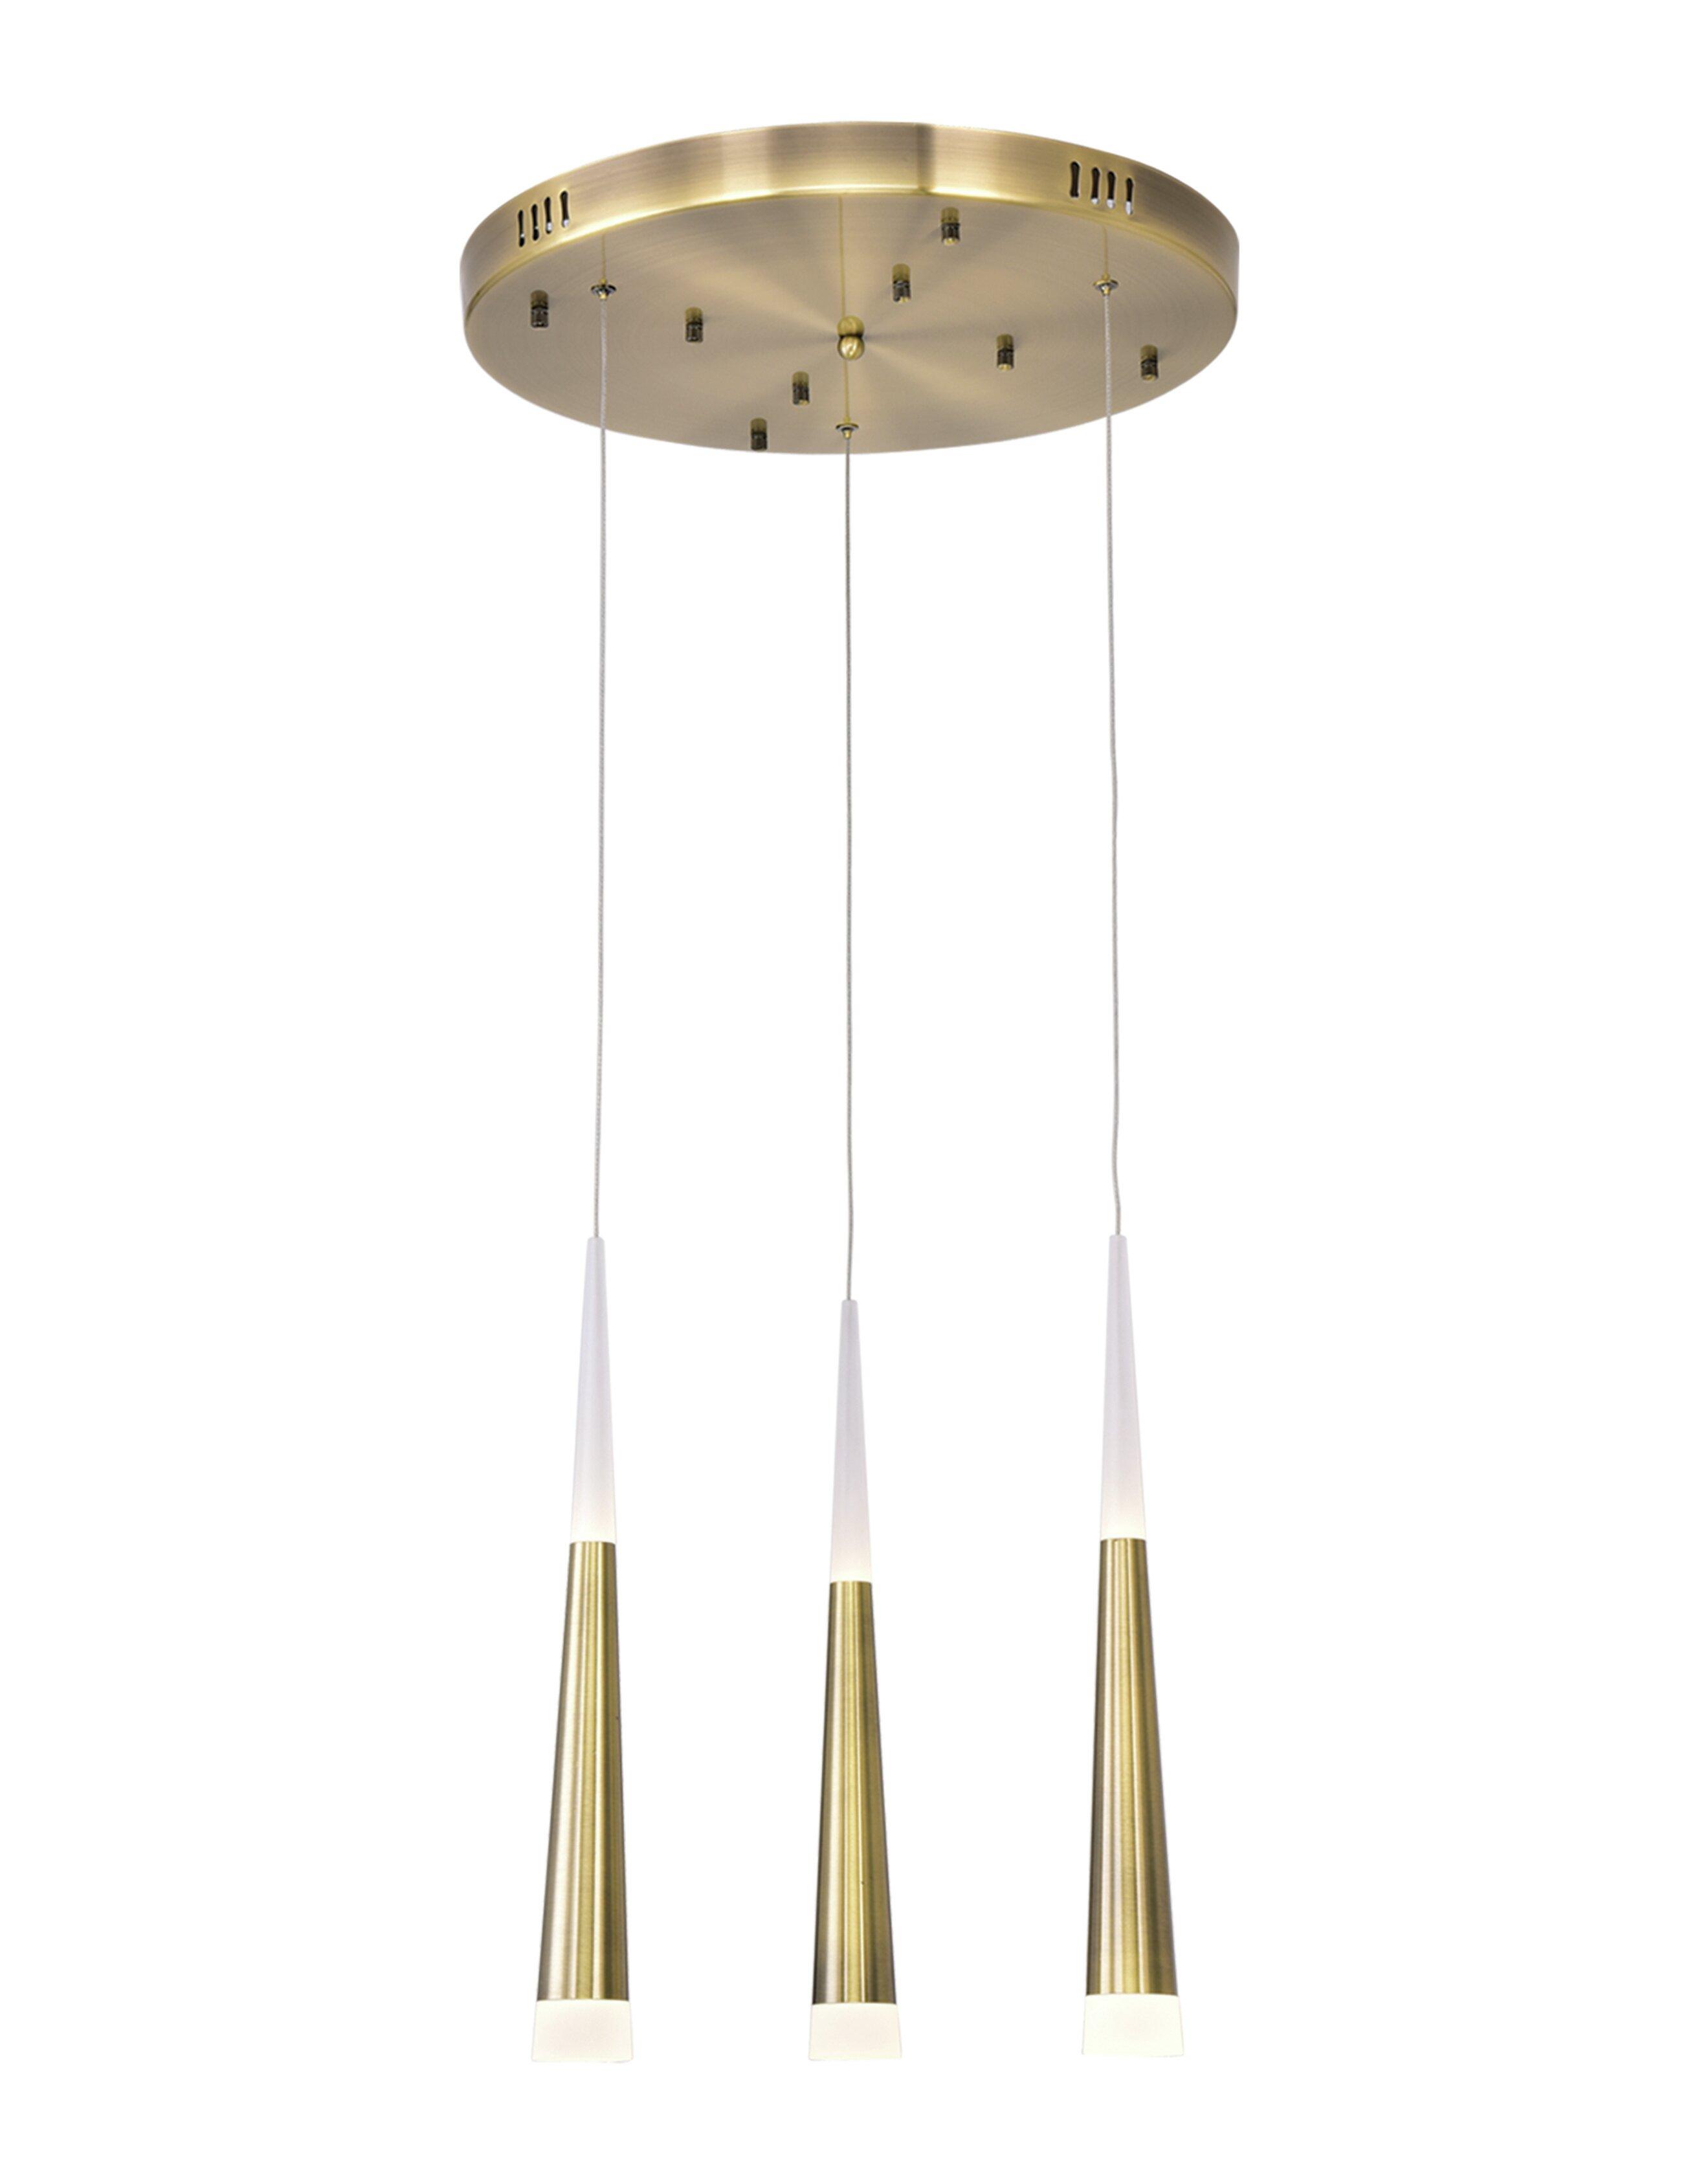 Cone Glam Pendant Lighting You Ll Love In 2021 Wayfair